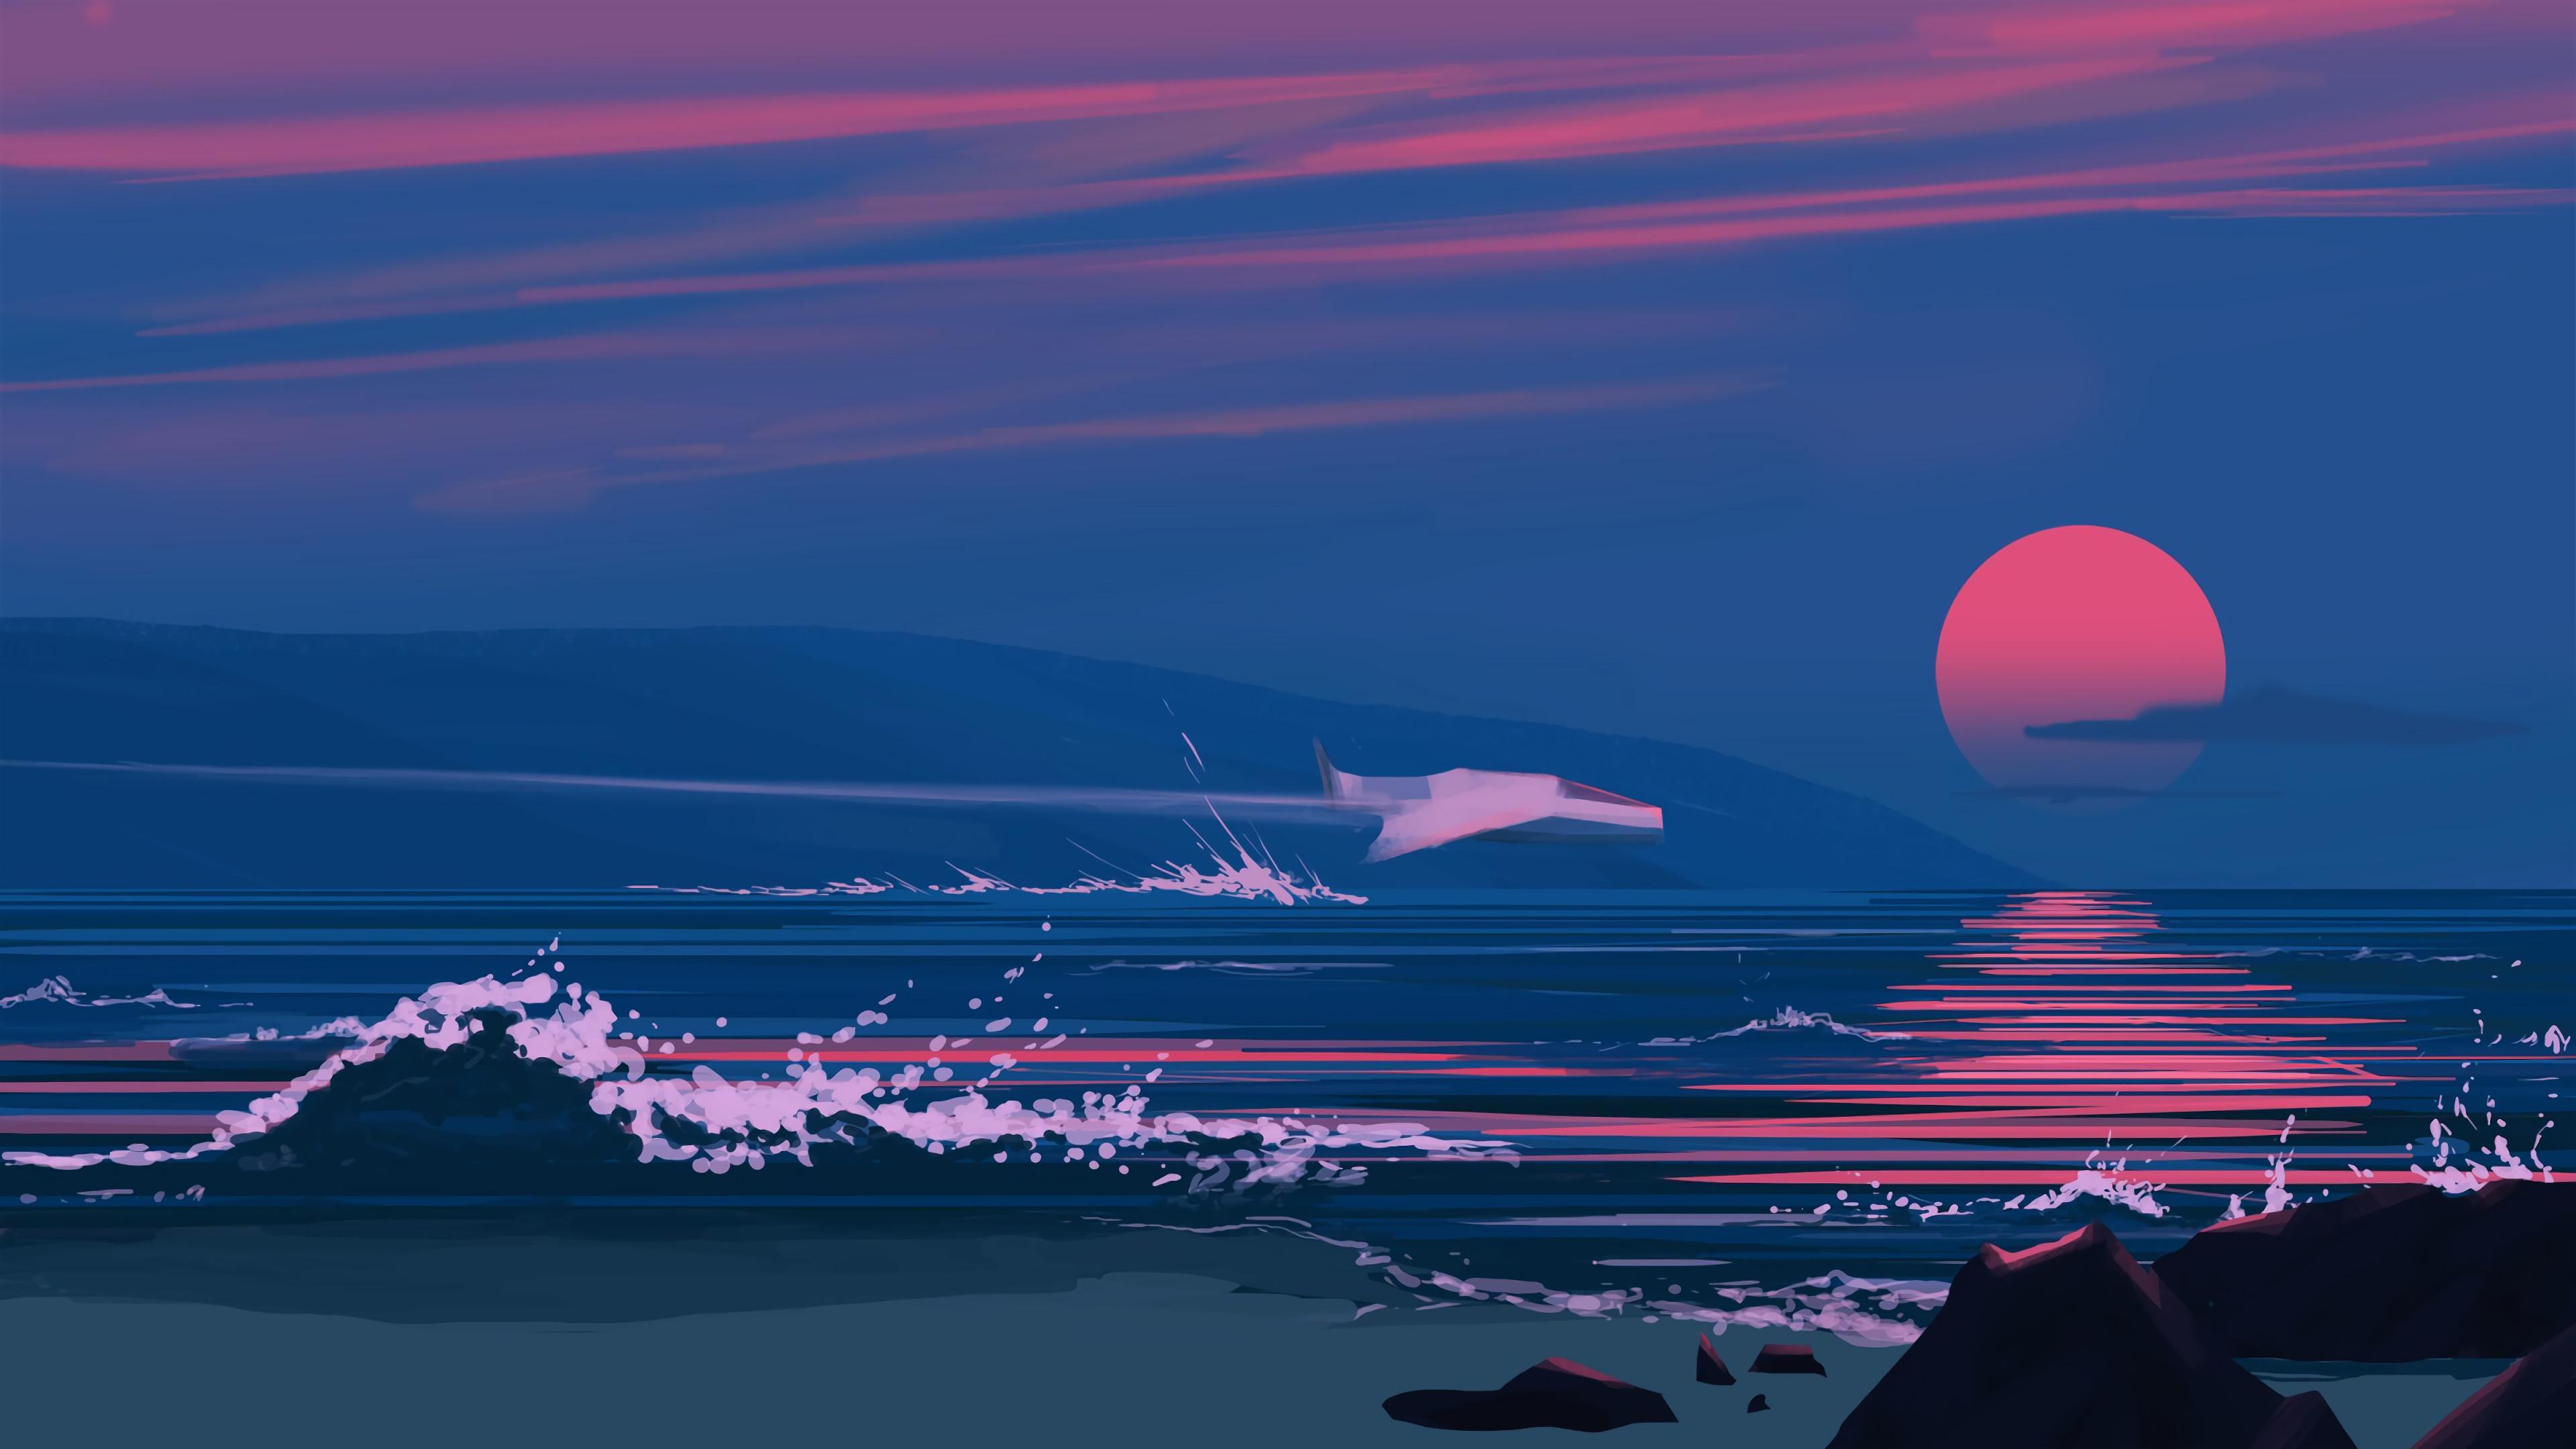 Minimalist Beach Wallpapers - Top Free Minimalist Beach ...